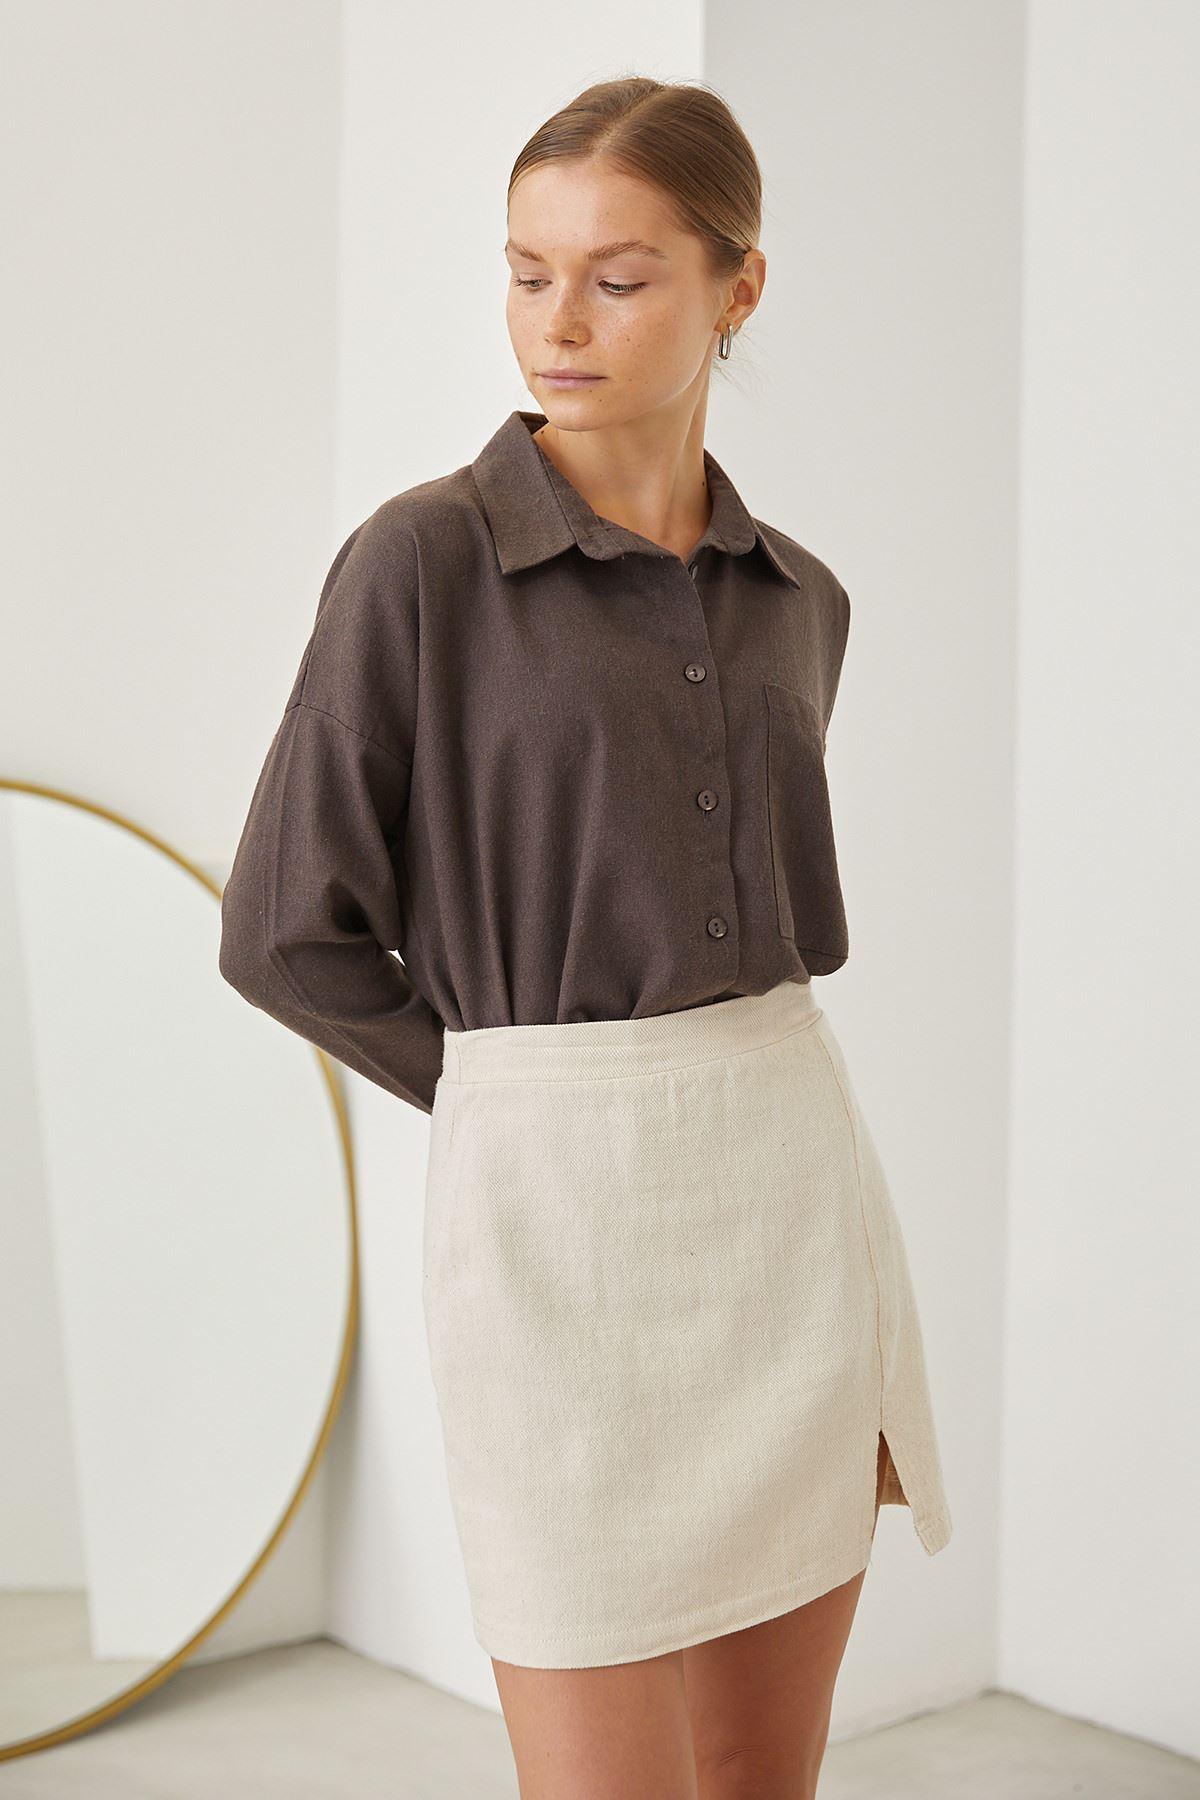 Cep Detay Klasik Gömlek-Kahve